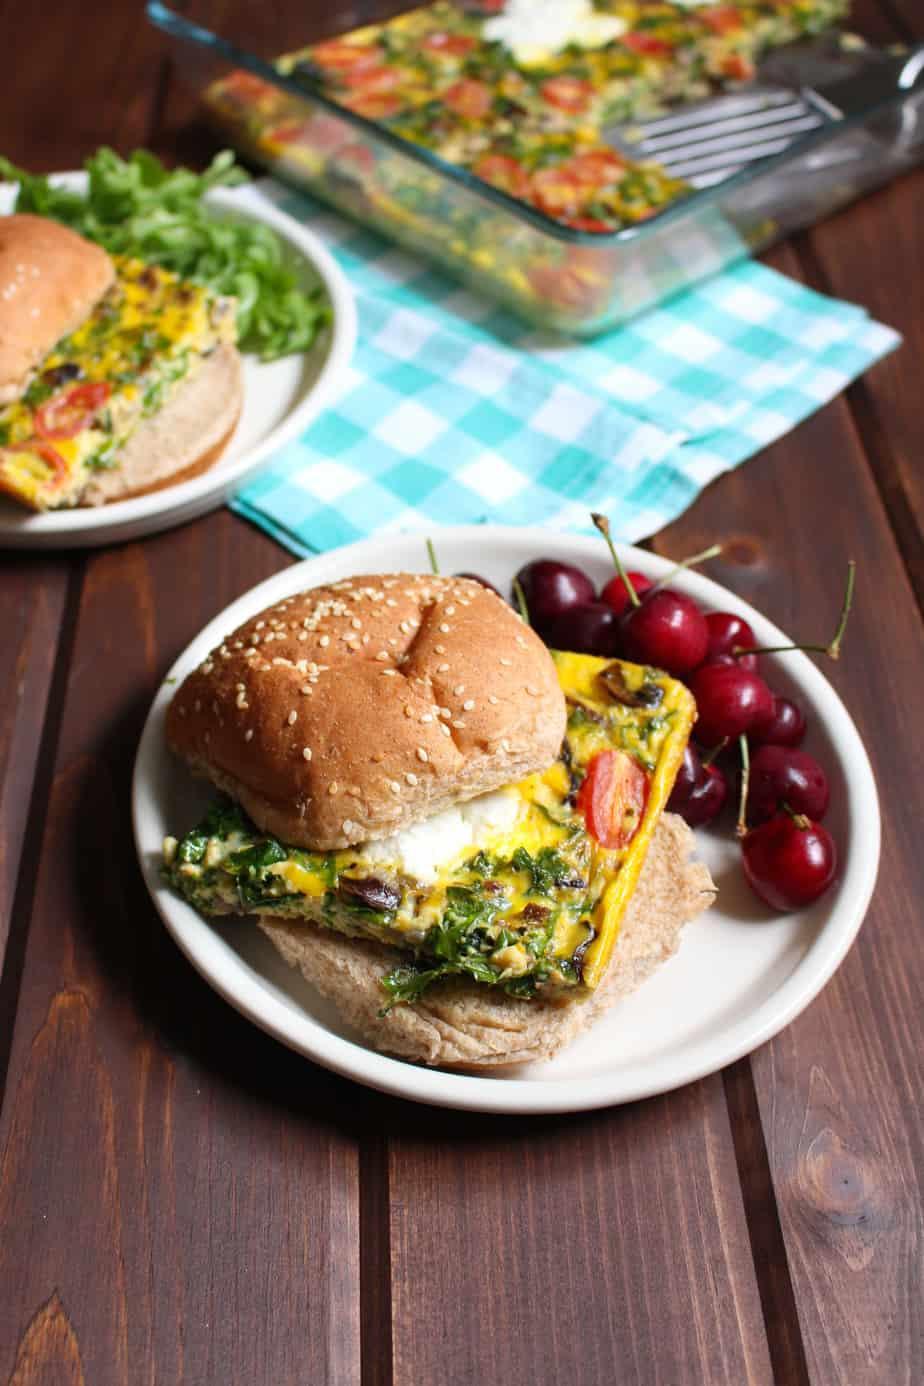 Frittata Breakfast Sandwiches | Frugal Nutrition